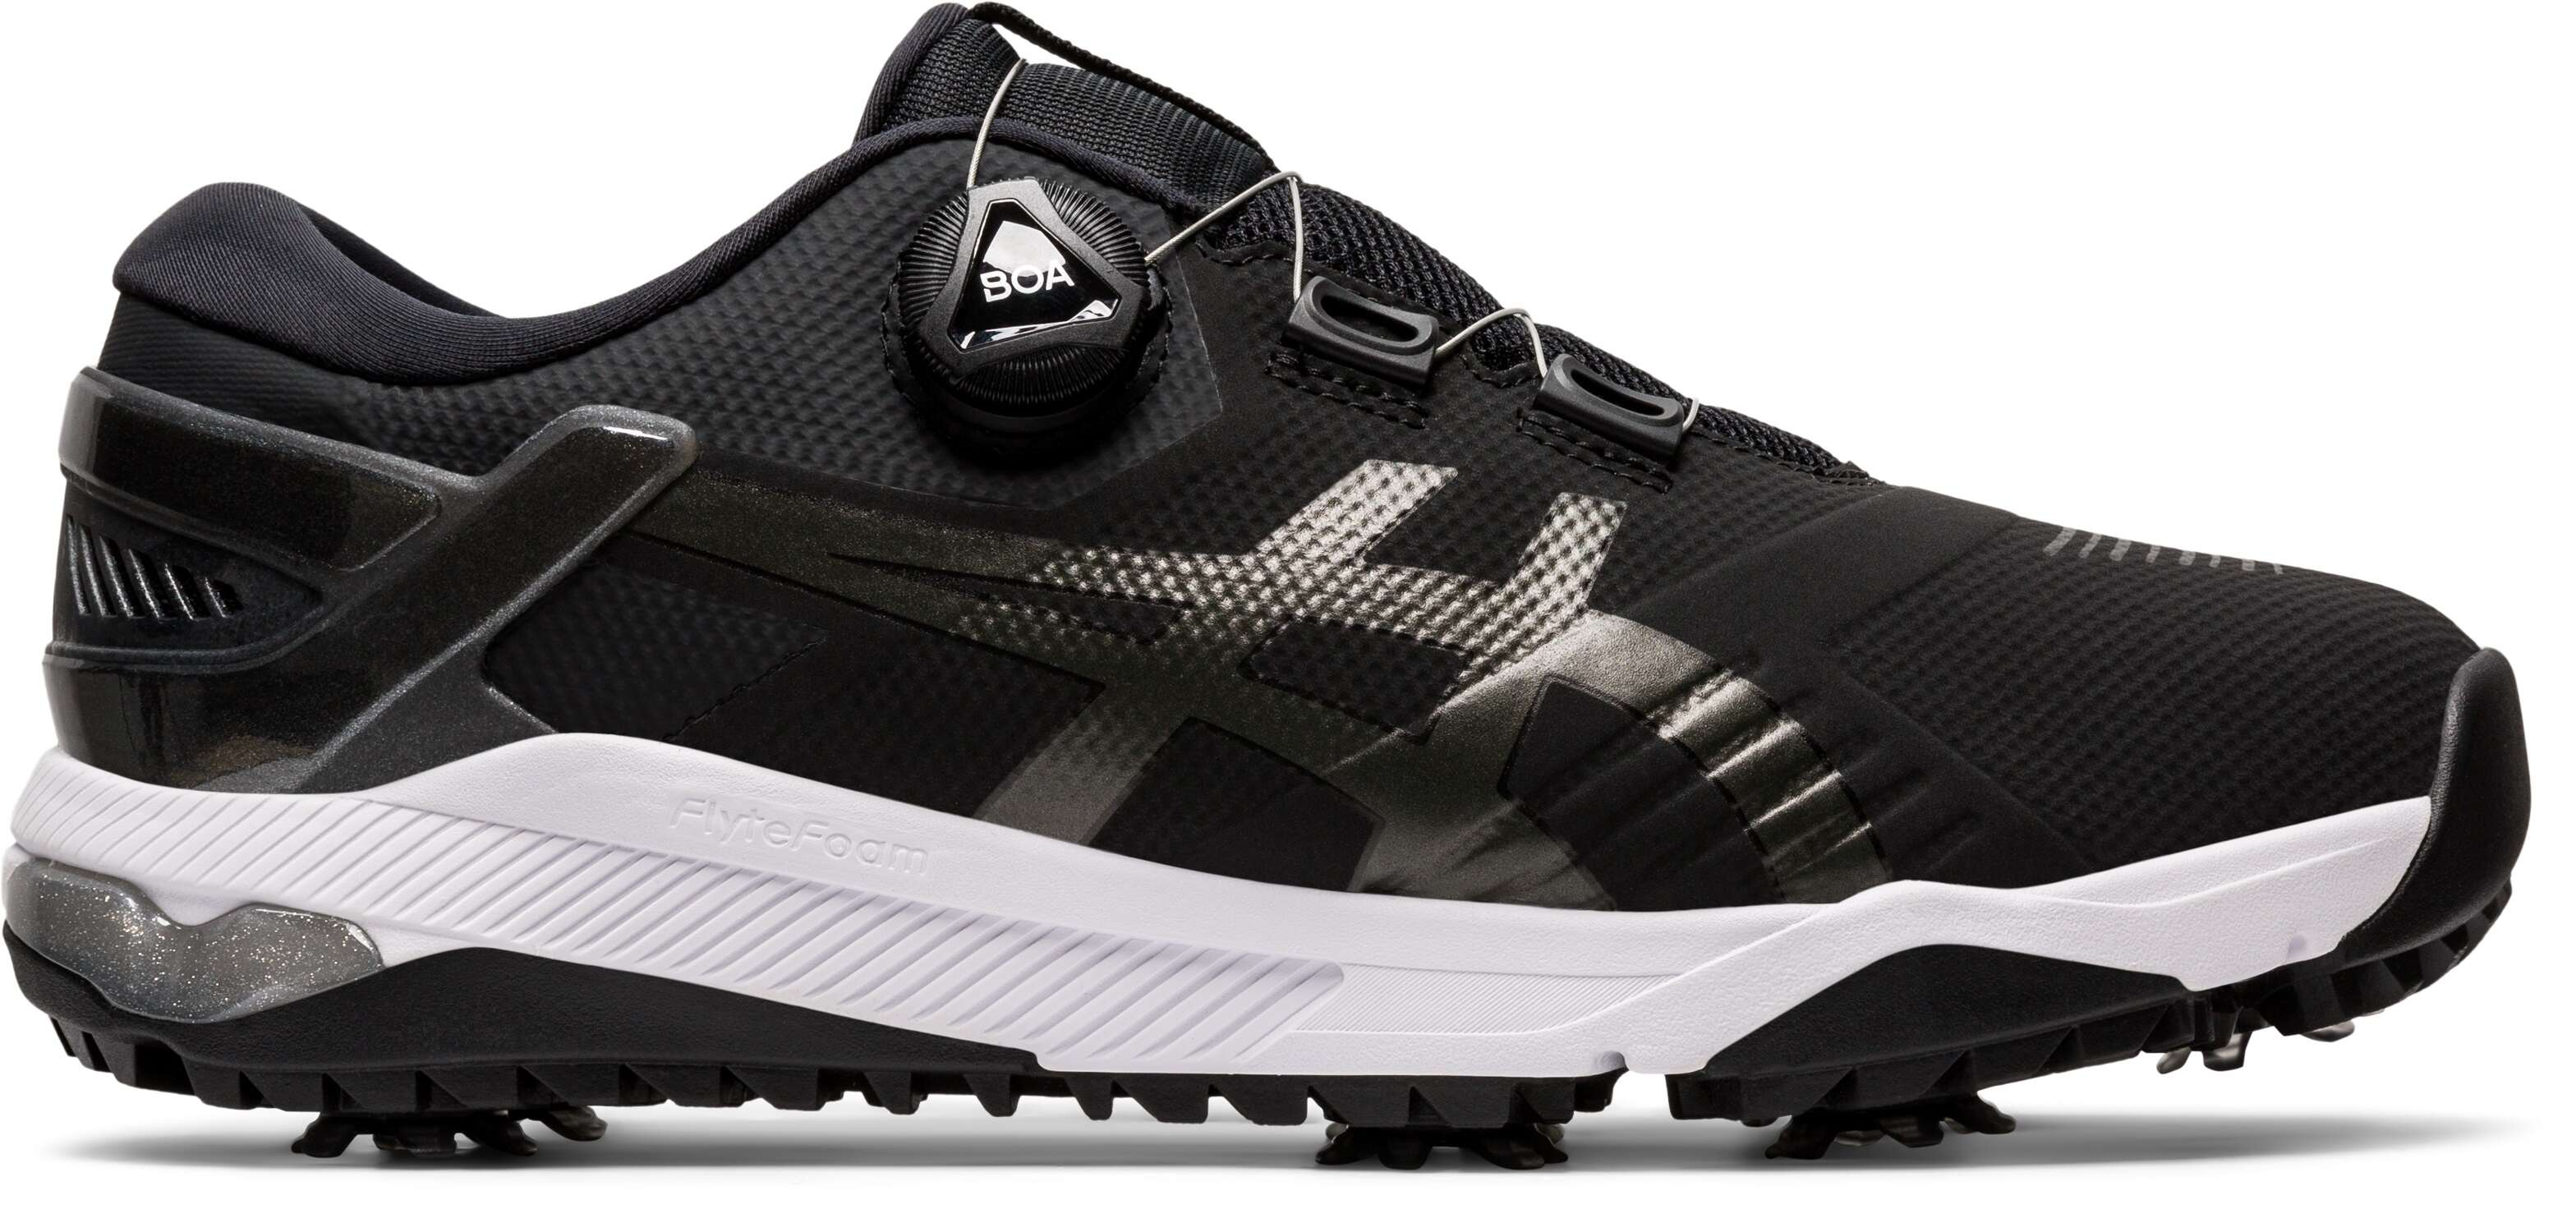 Asics Golf Gel-Course Duo BOA Shoes | RockBottomGolf.com